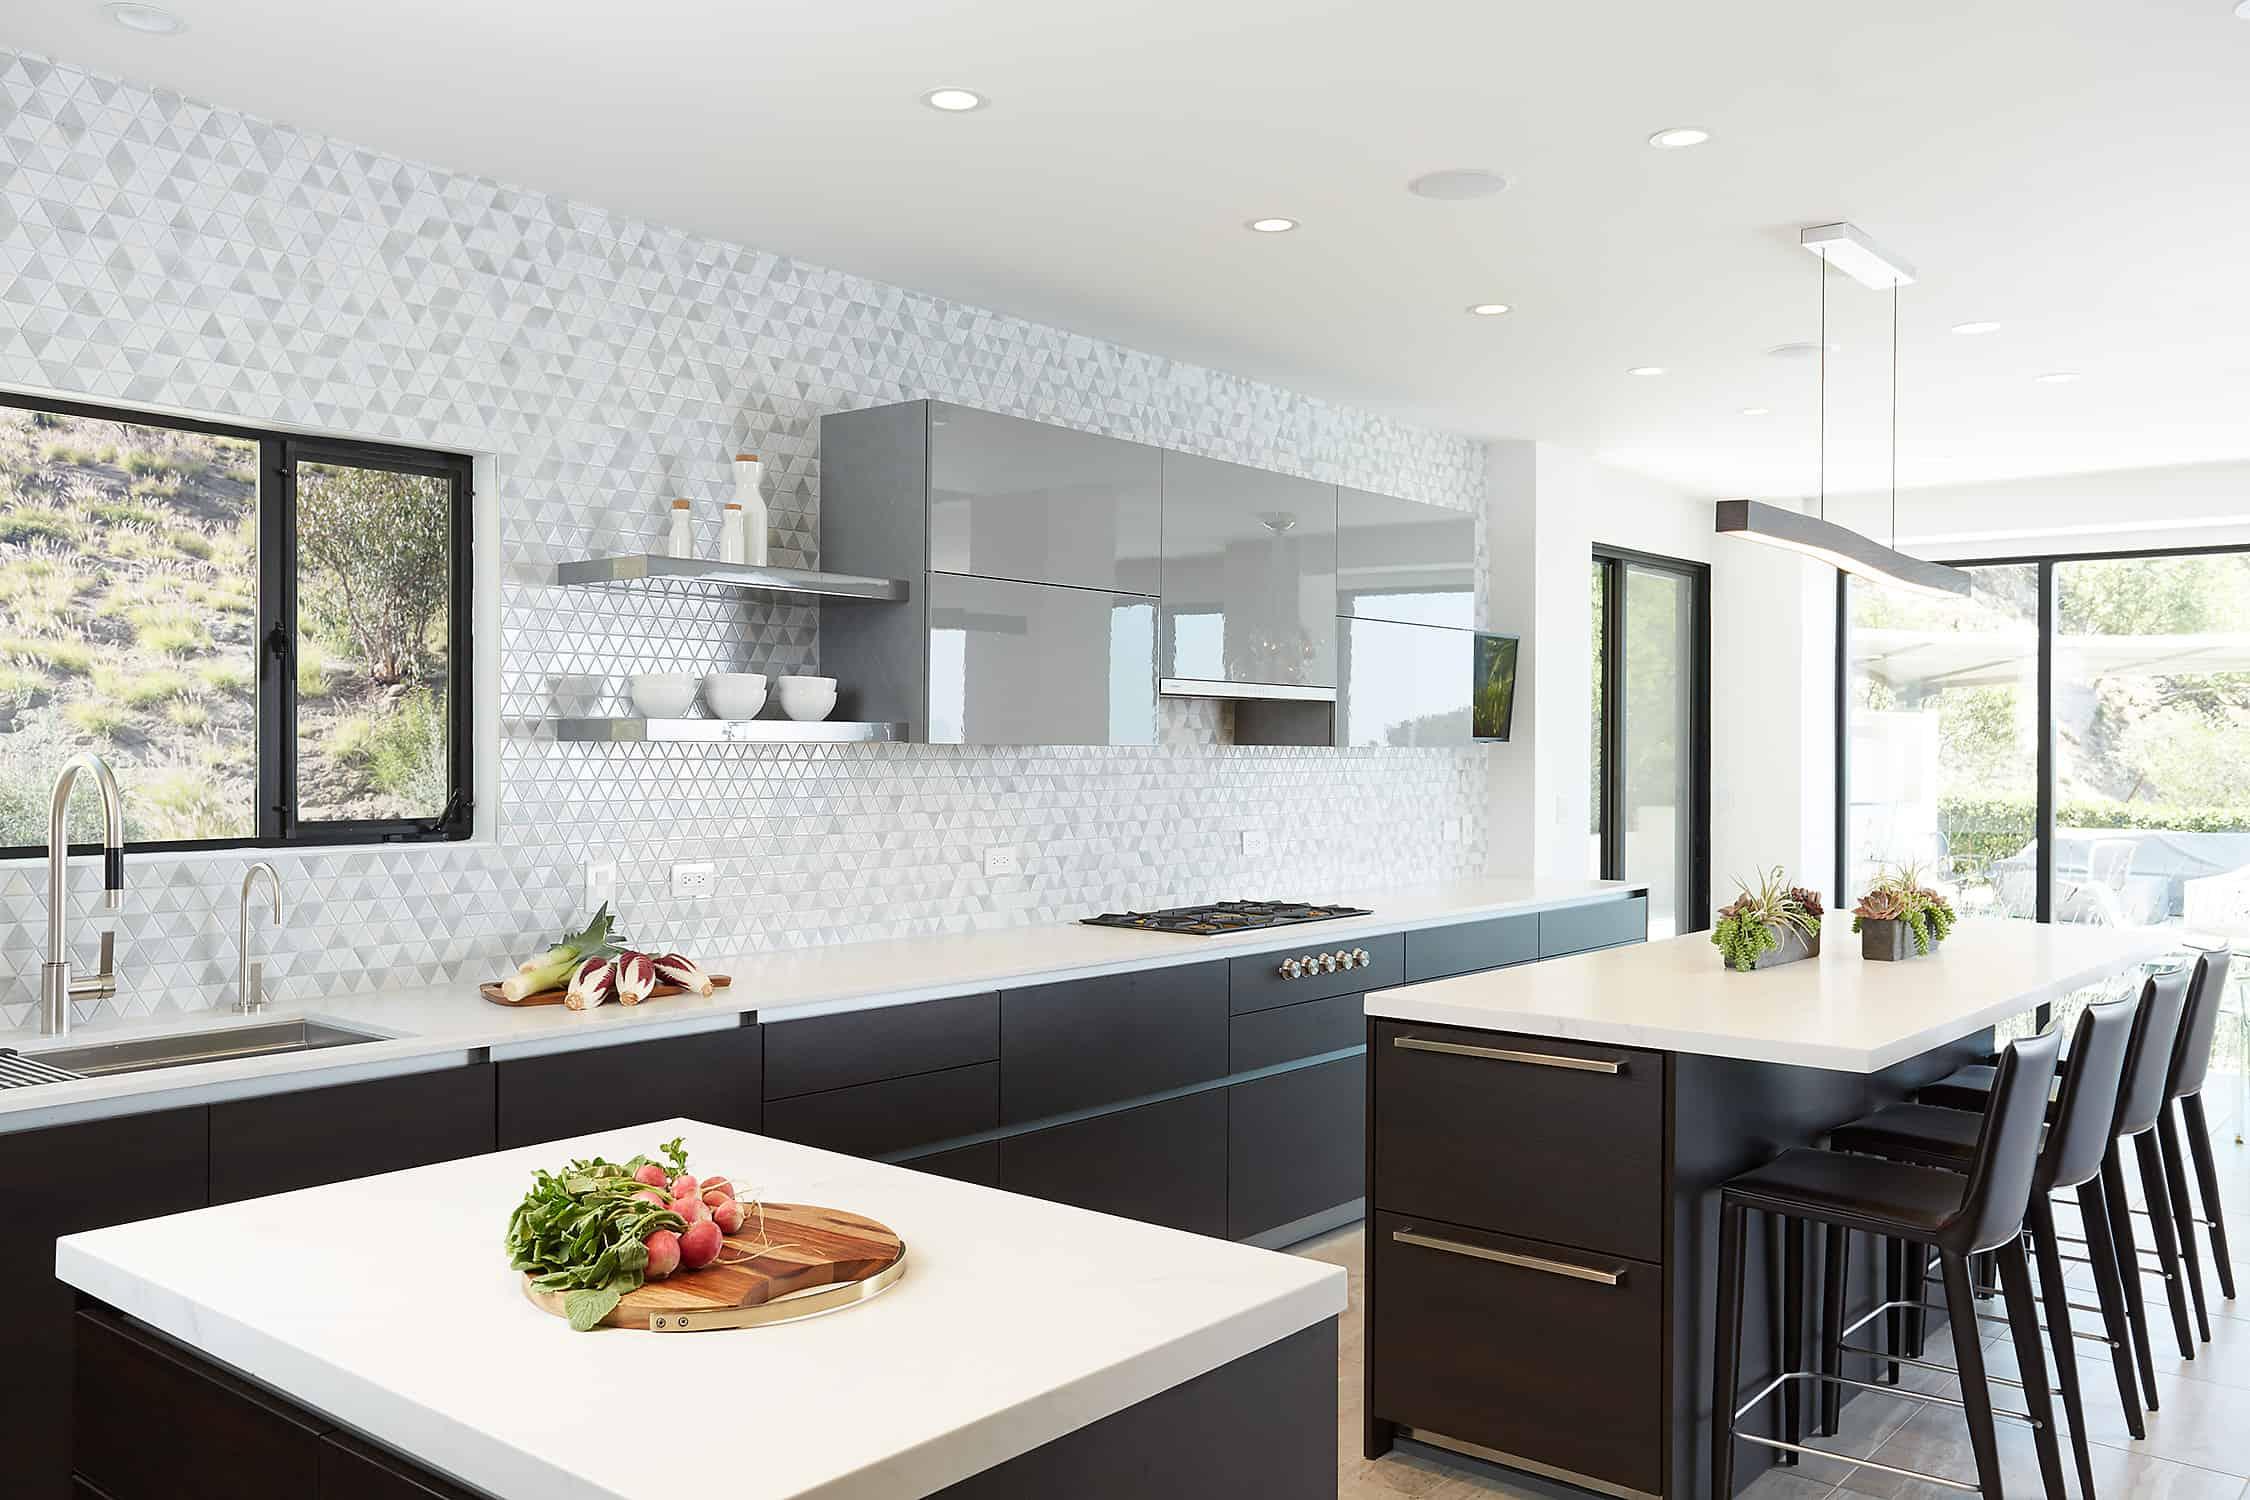 moussa kitchen project completed by eggersmann la features 2 separate kitchen islands